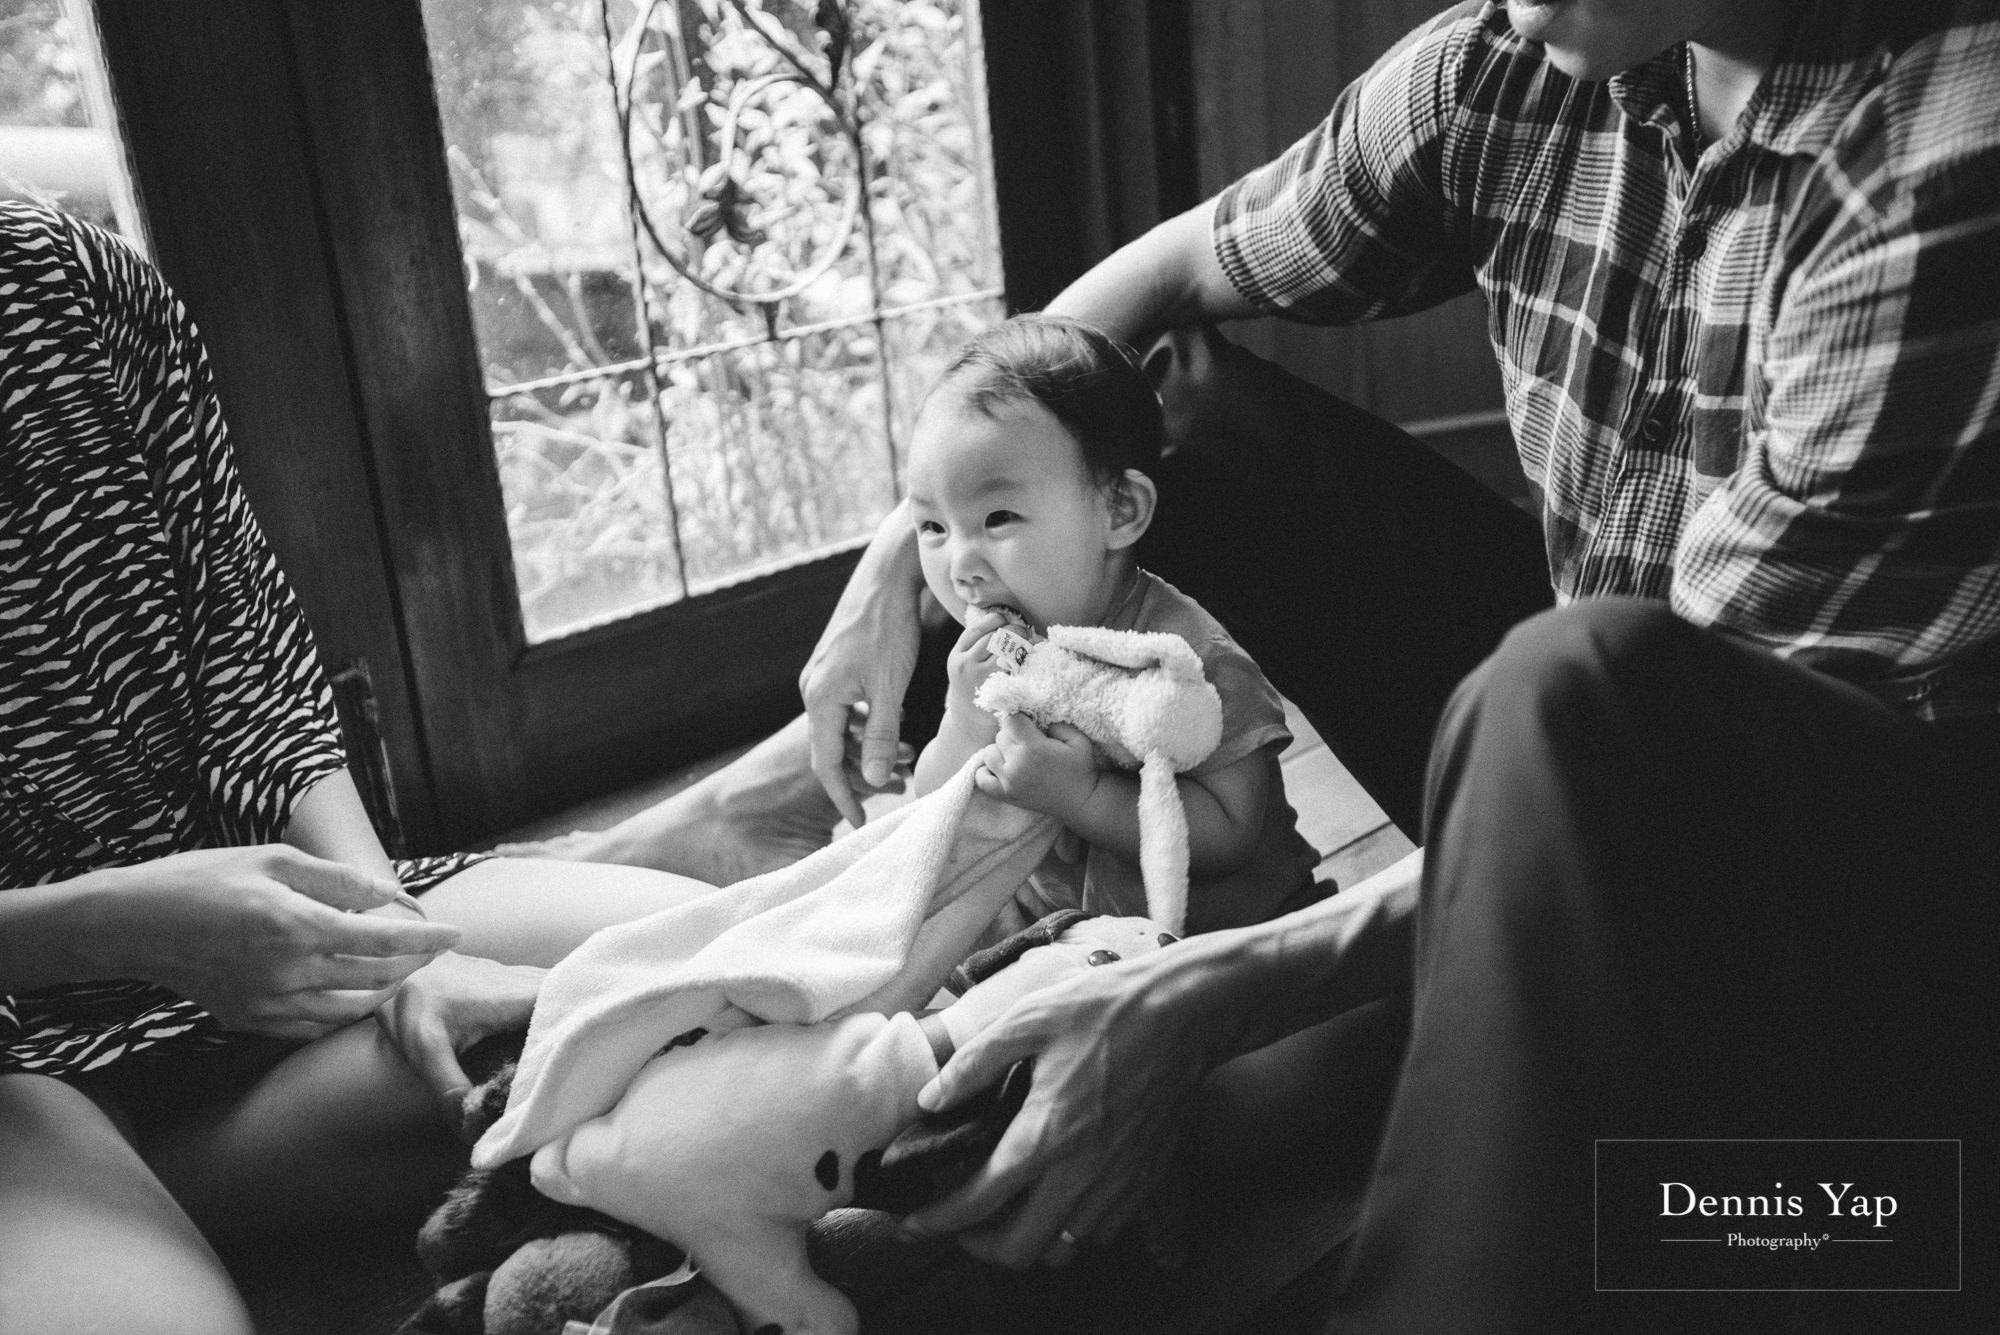 thong family chuen thong portrait beloved dennis yap photography-10.jpg